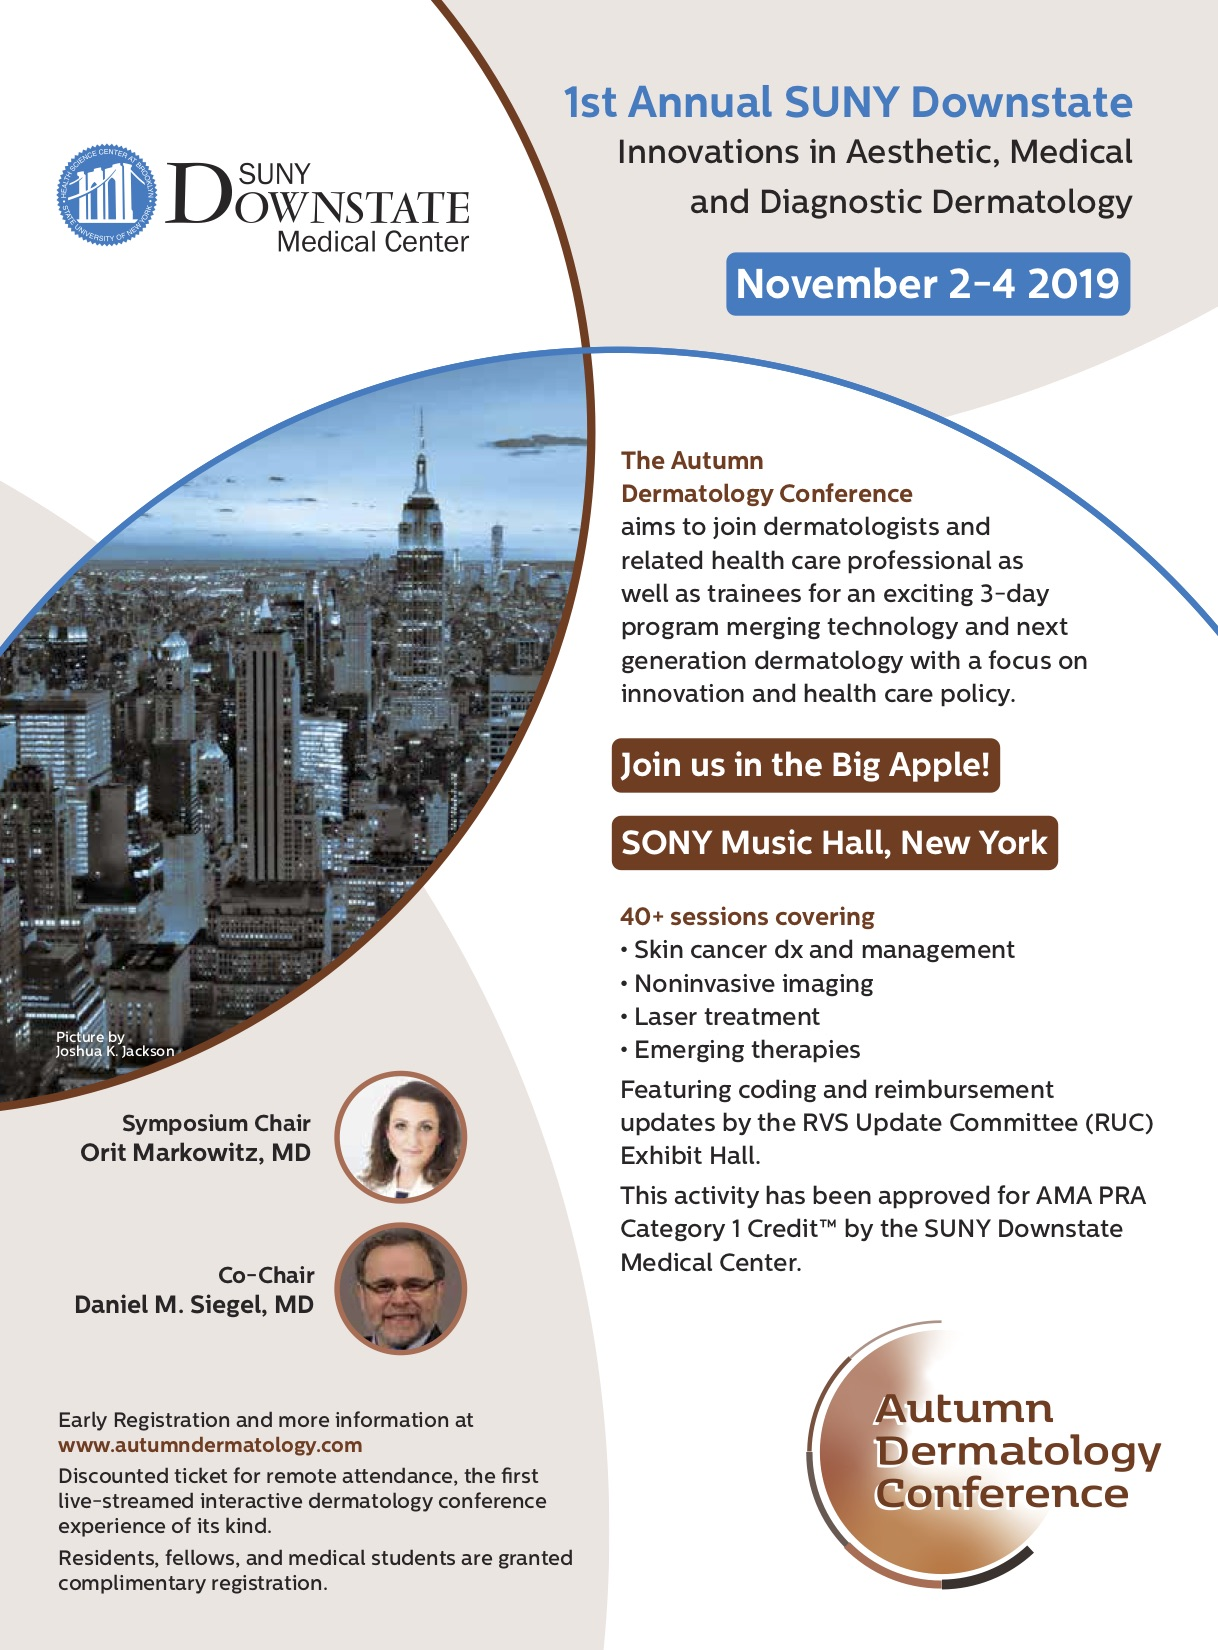 Autumn Dermatology Conference Tickets, Sat, Nov 2, 2019 at 8